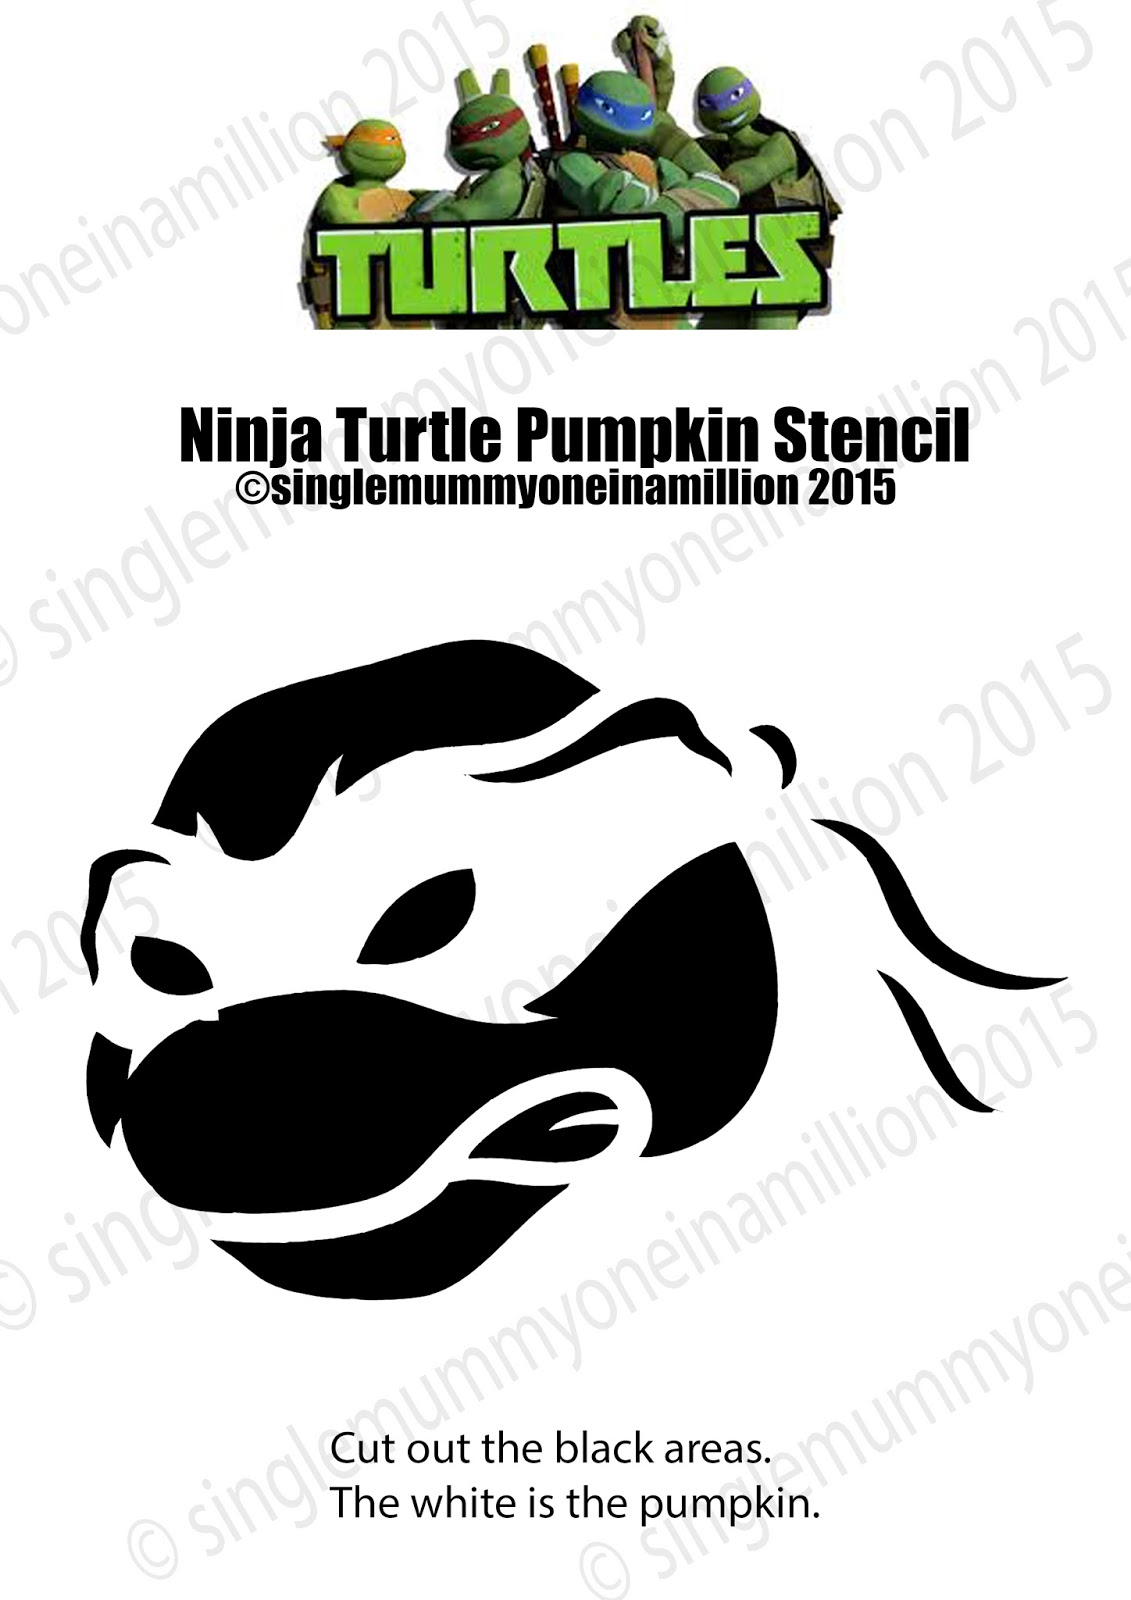 single mummy; one in a million: ninja turtle pumpkin stencil